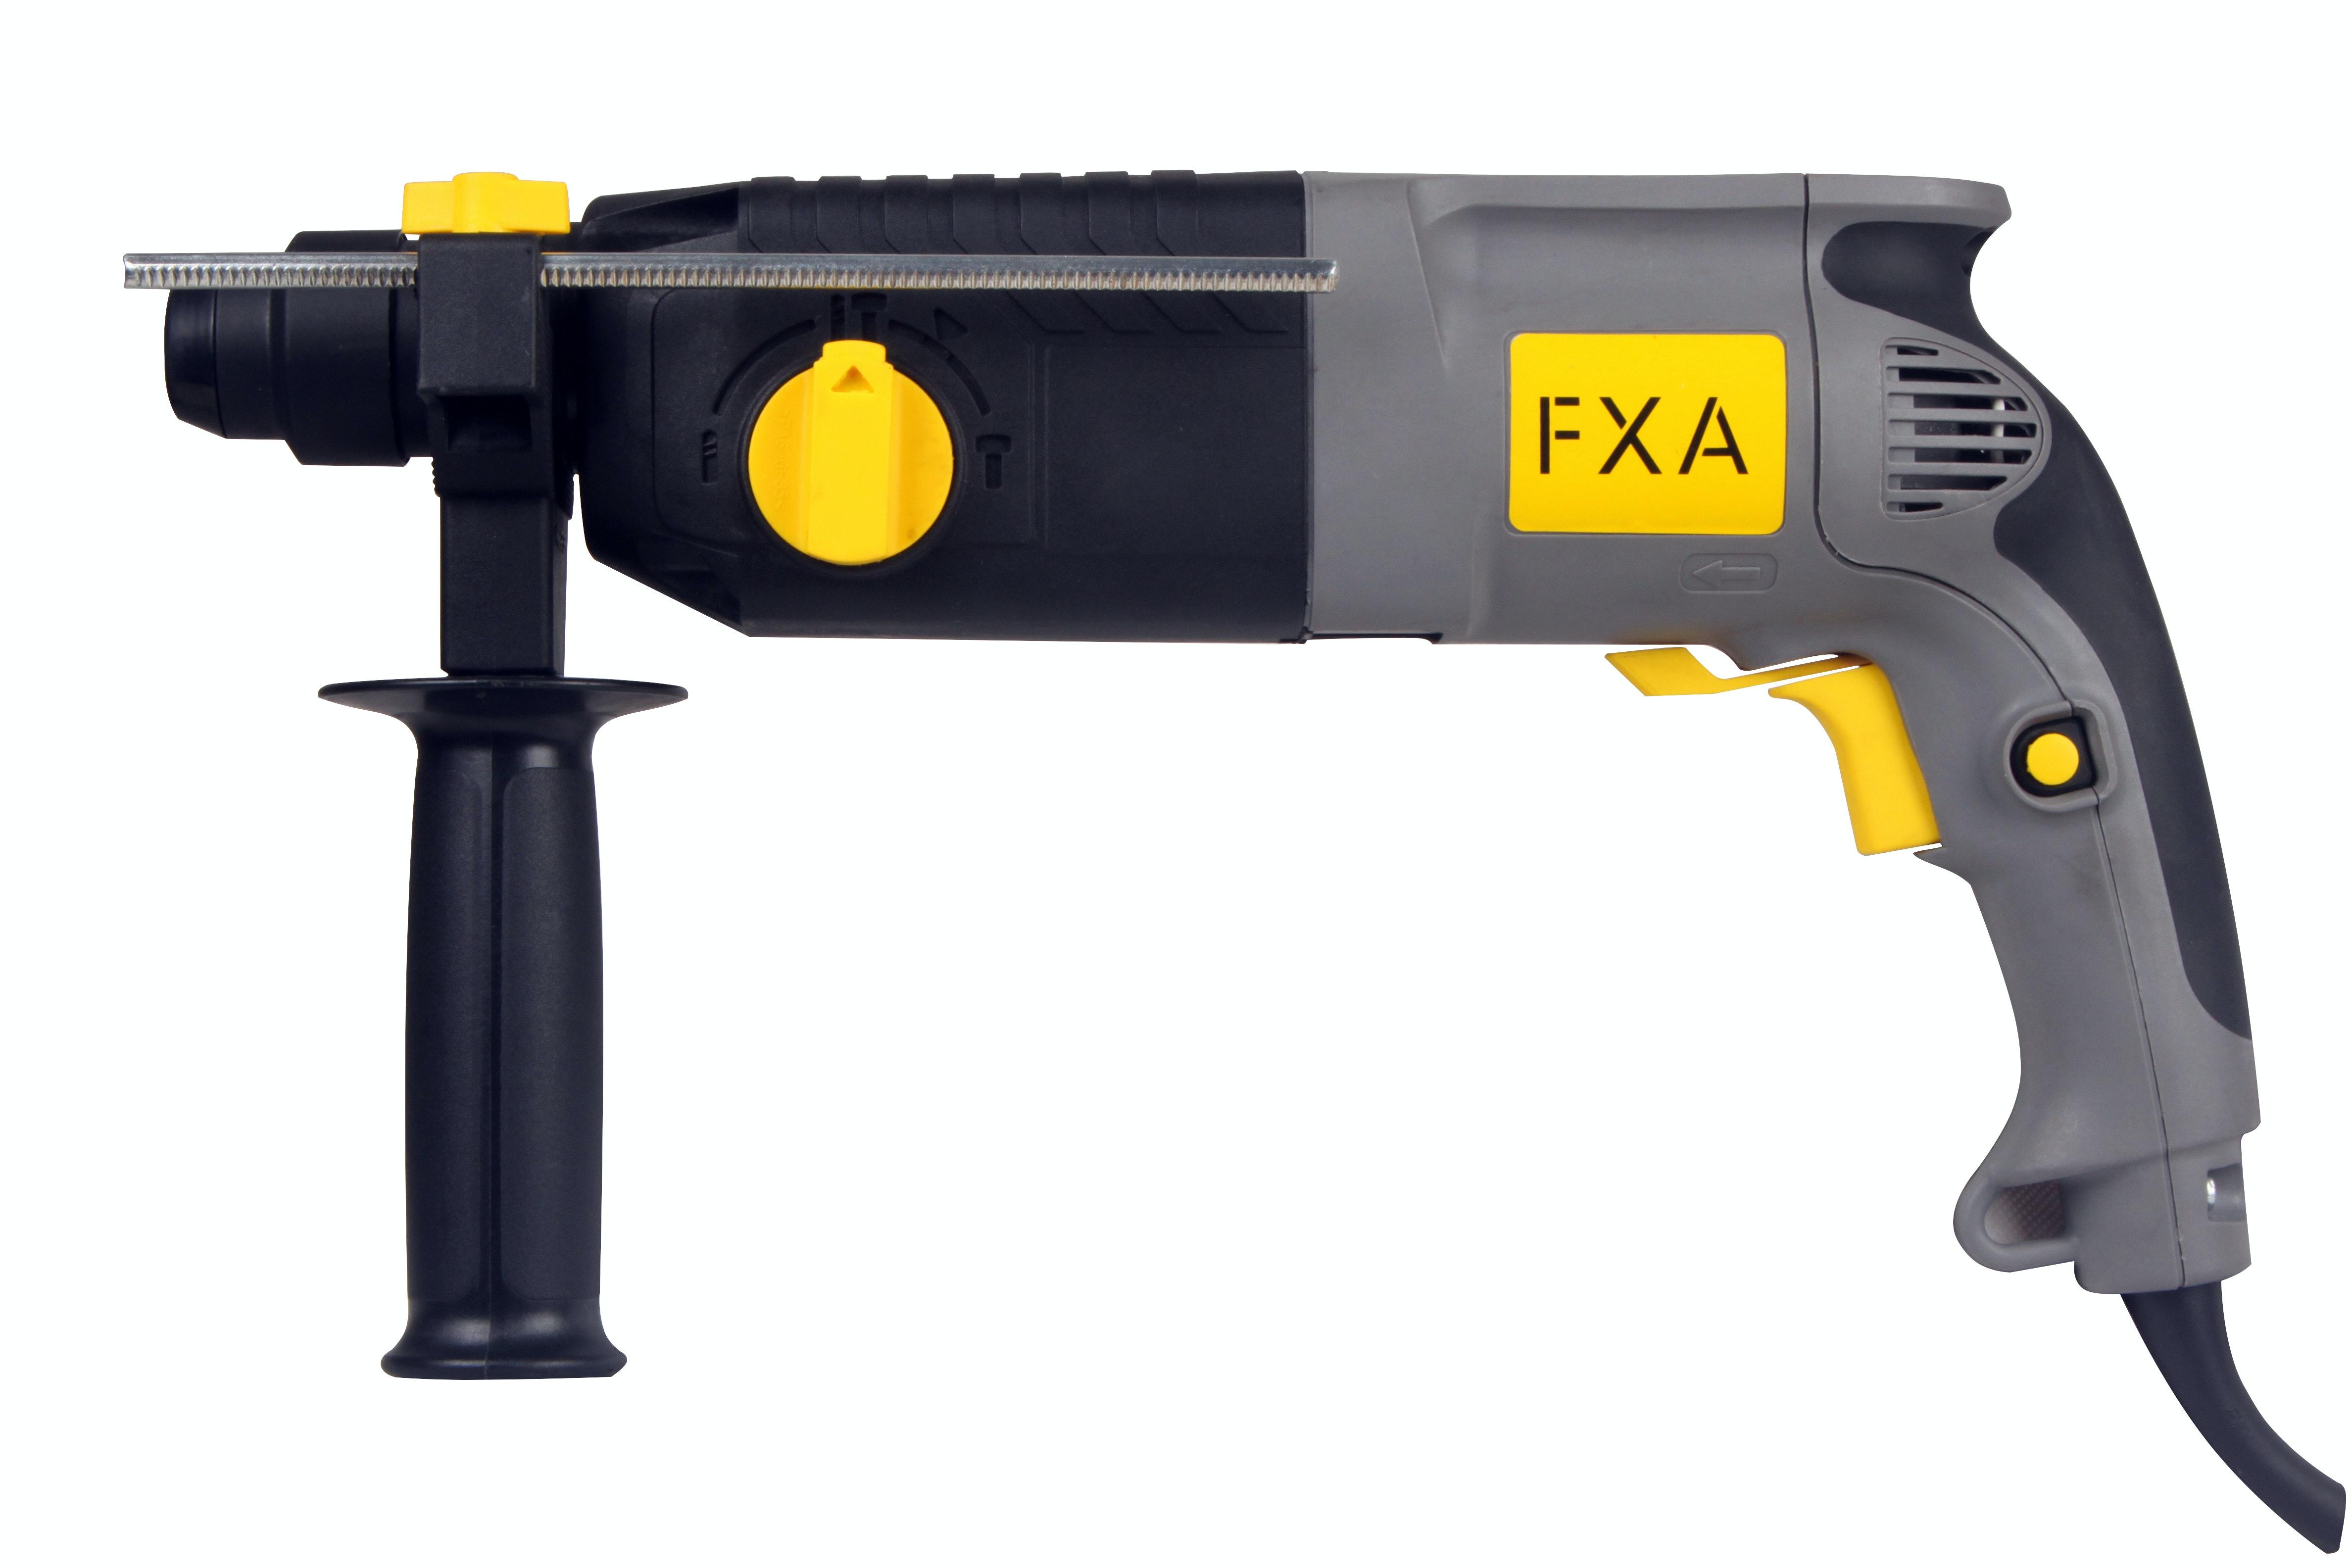 Slagborr FXA 620W